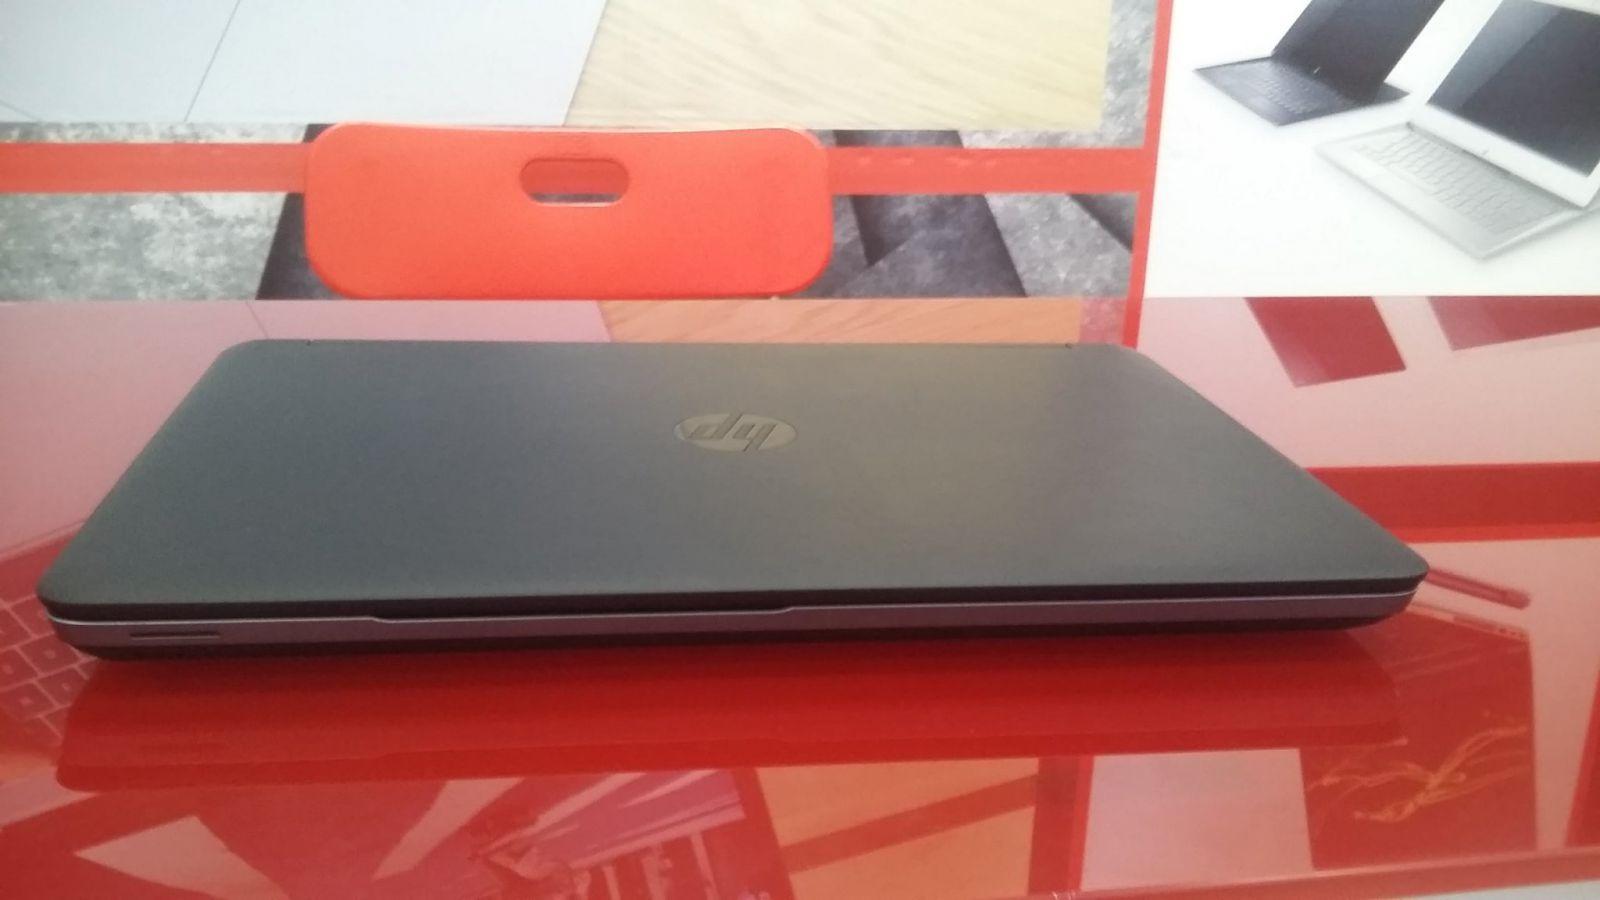 HP PROBOOK 650 G1 I5 (core i5 4200M, ram 4gb, hdd 500gb, 15.6 inch)